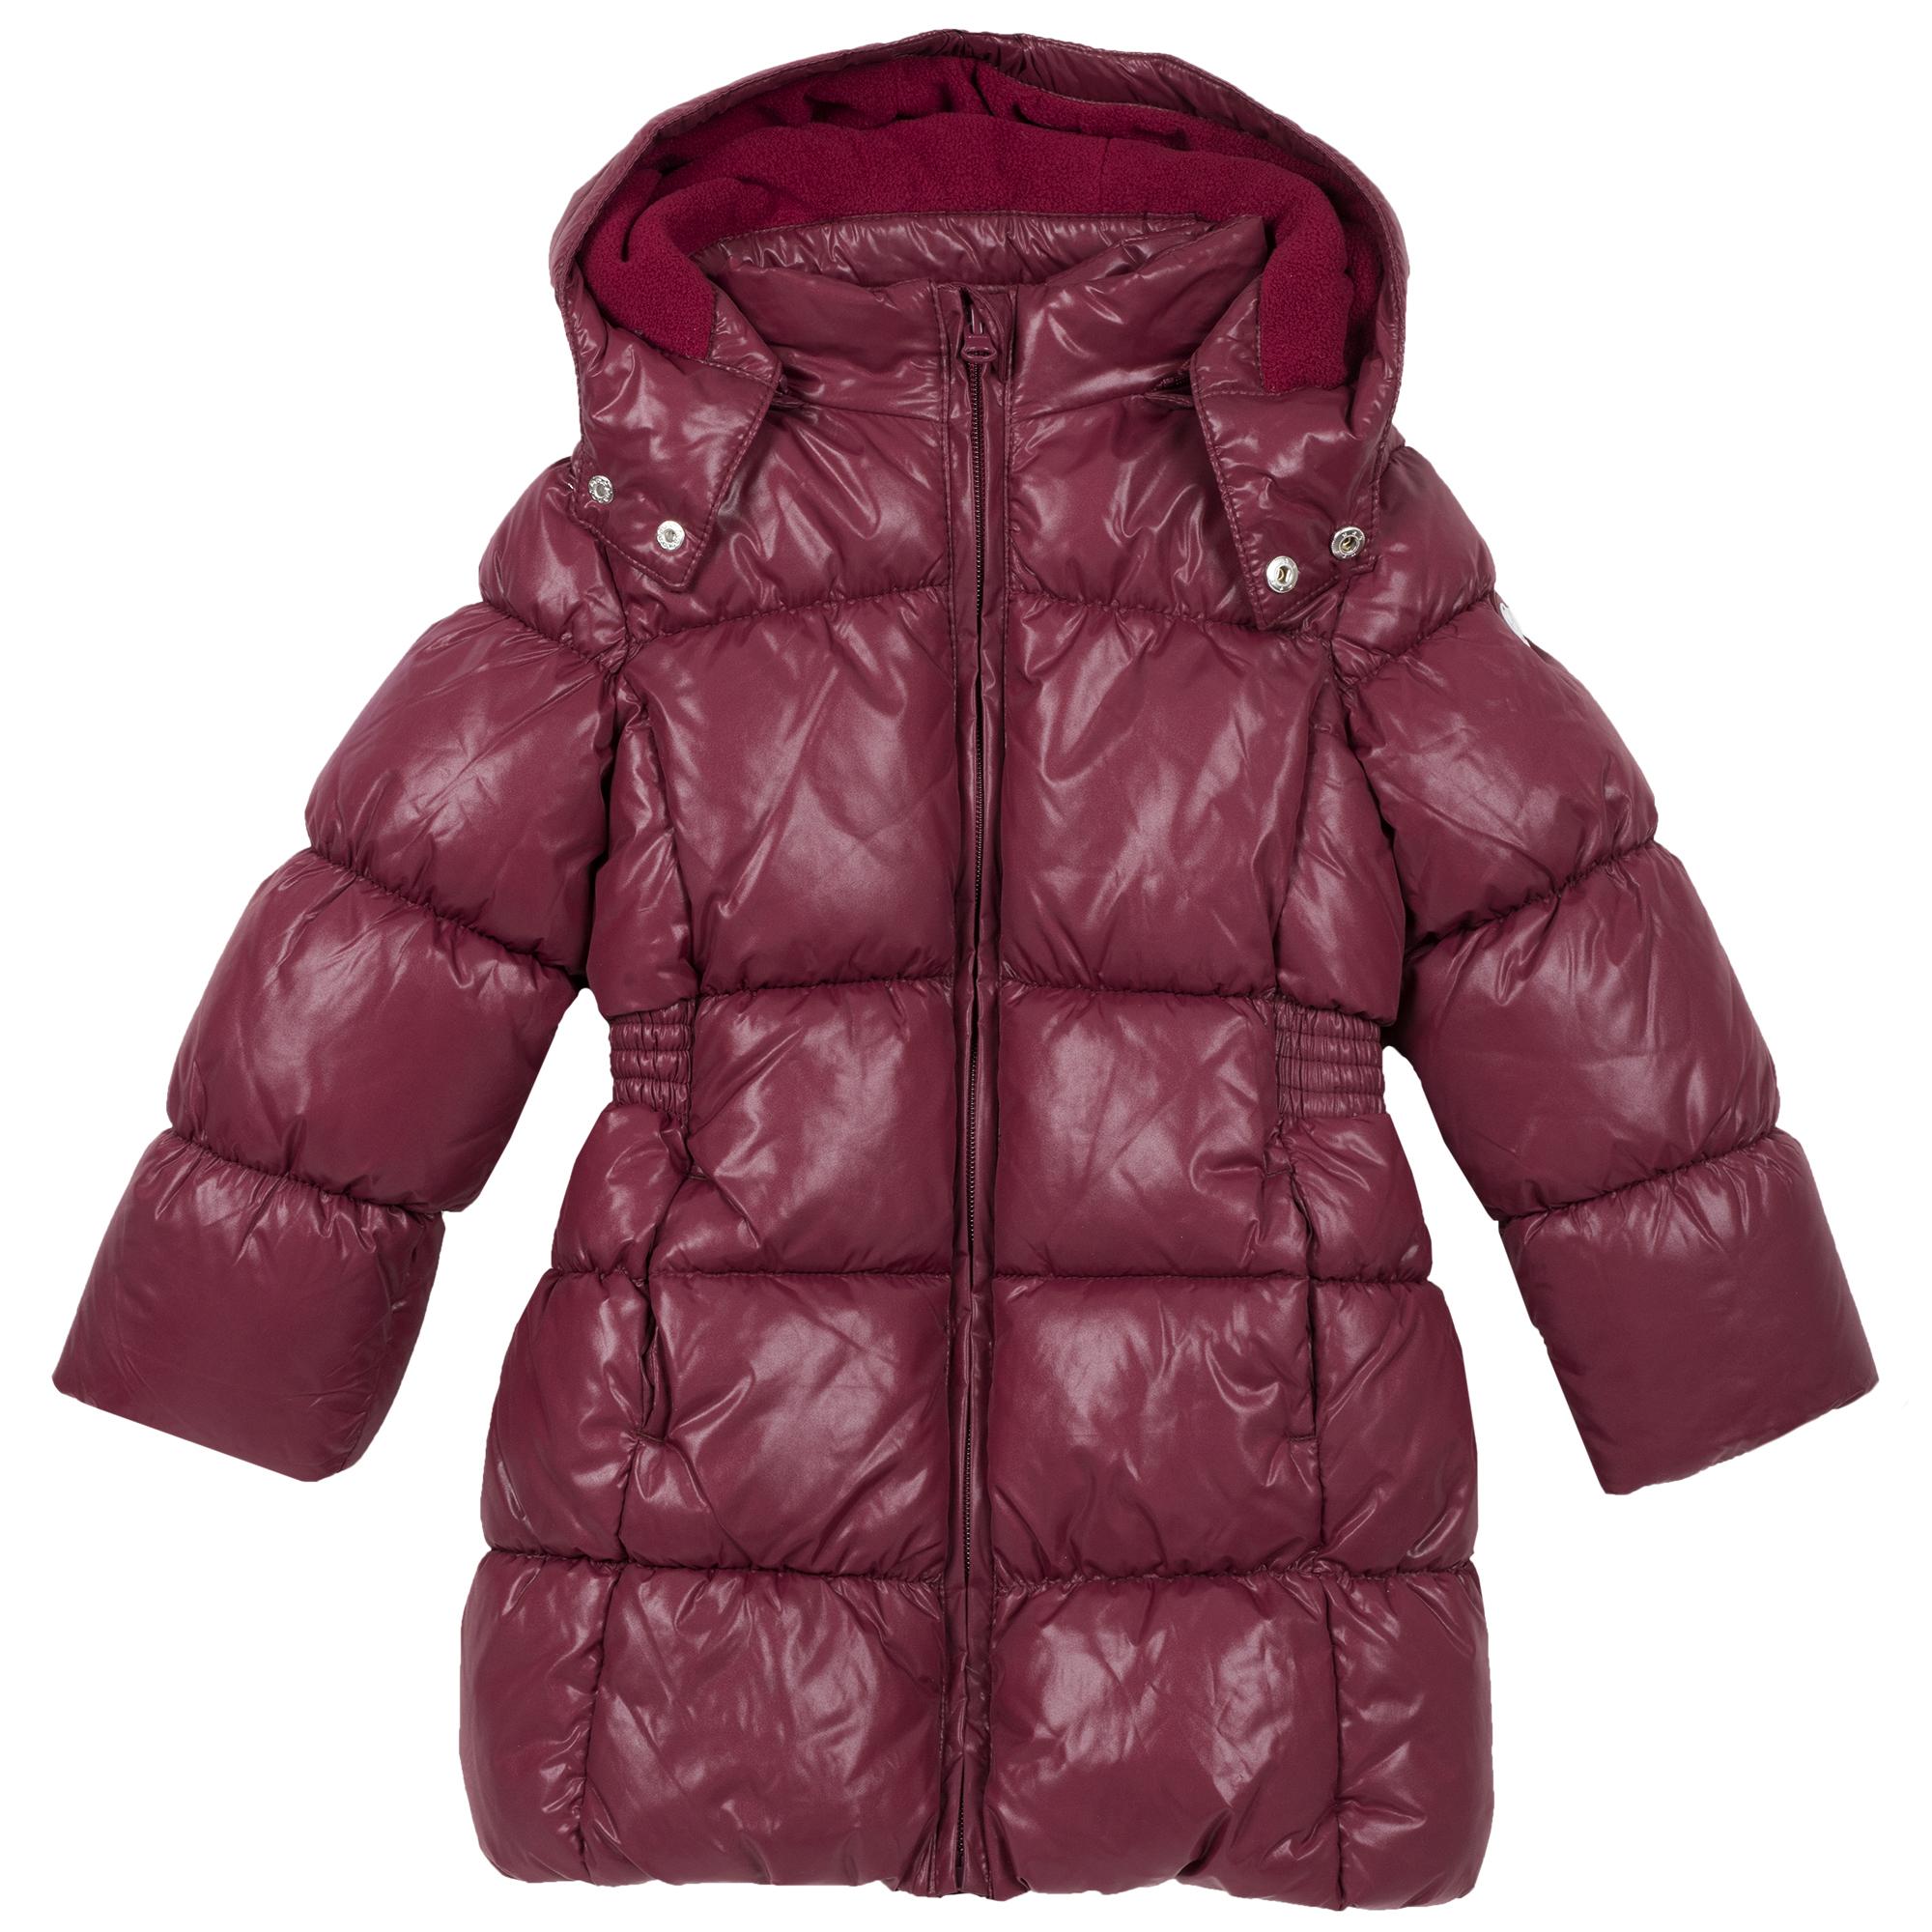 Jacheta copii Chicco, visiniu